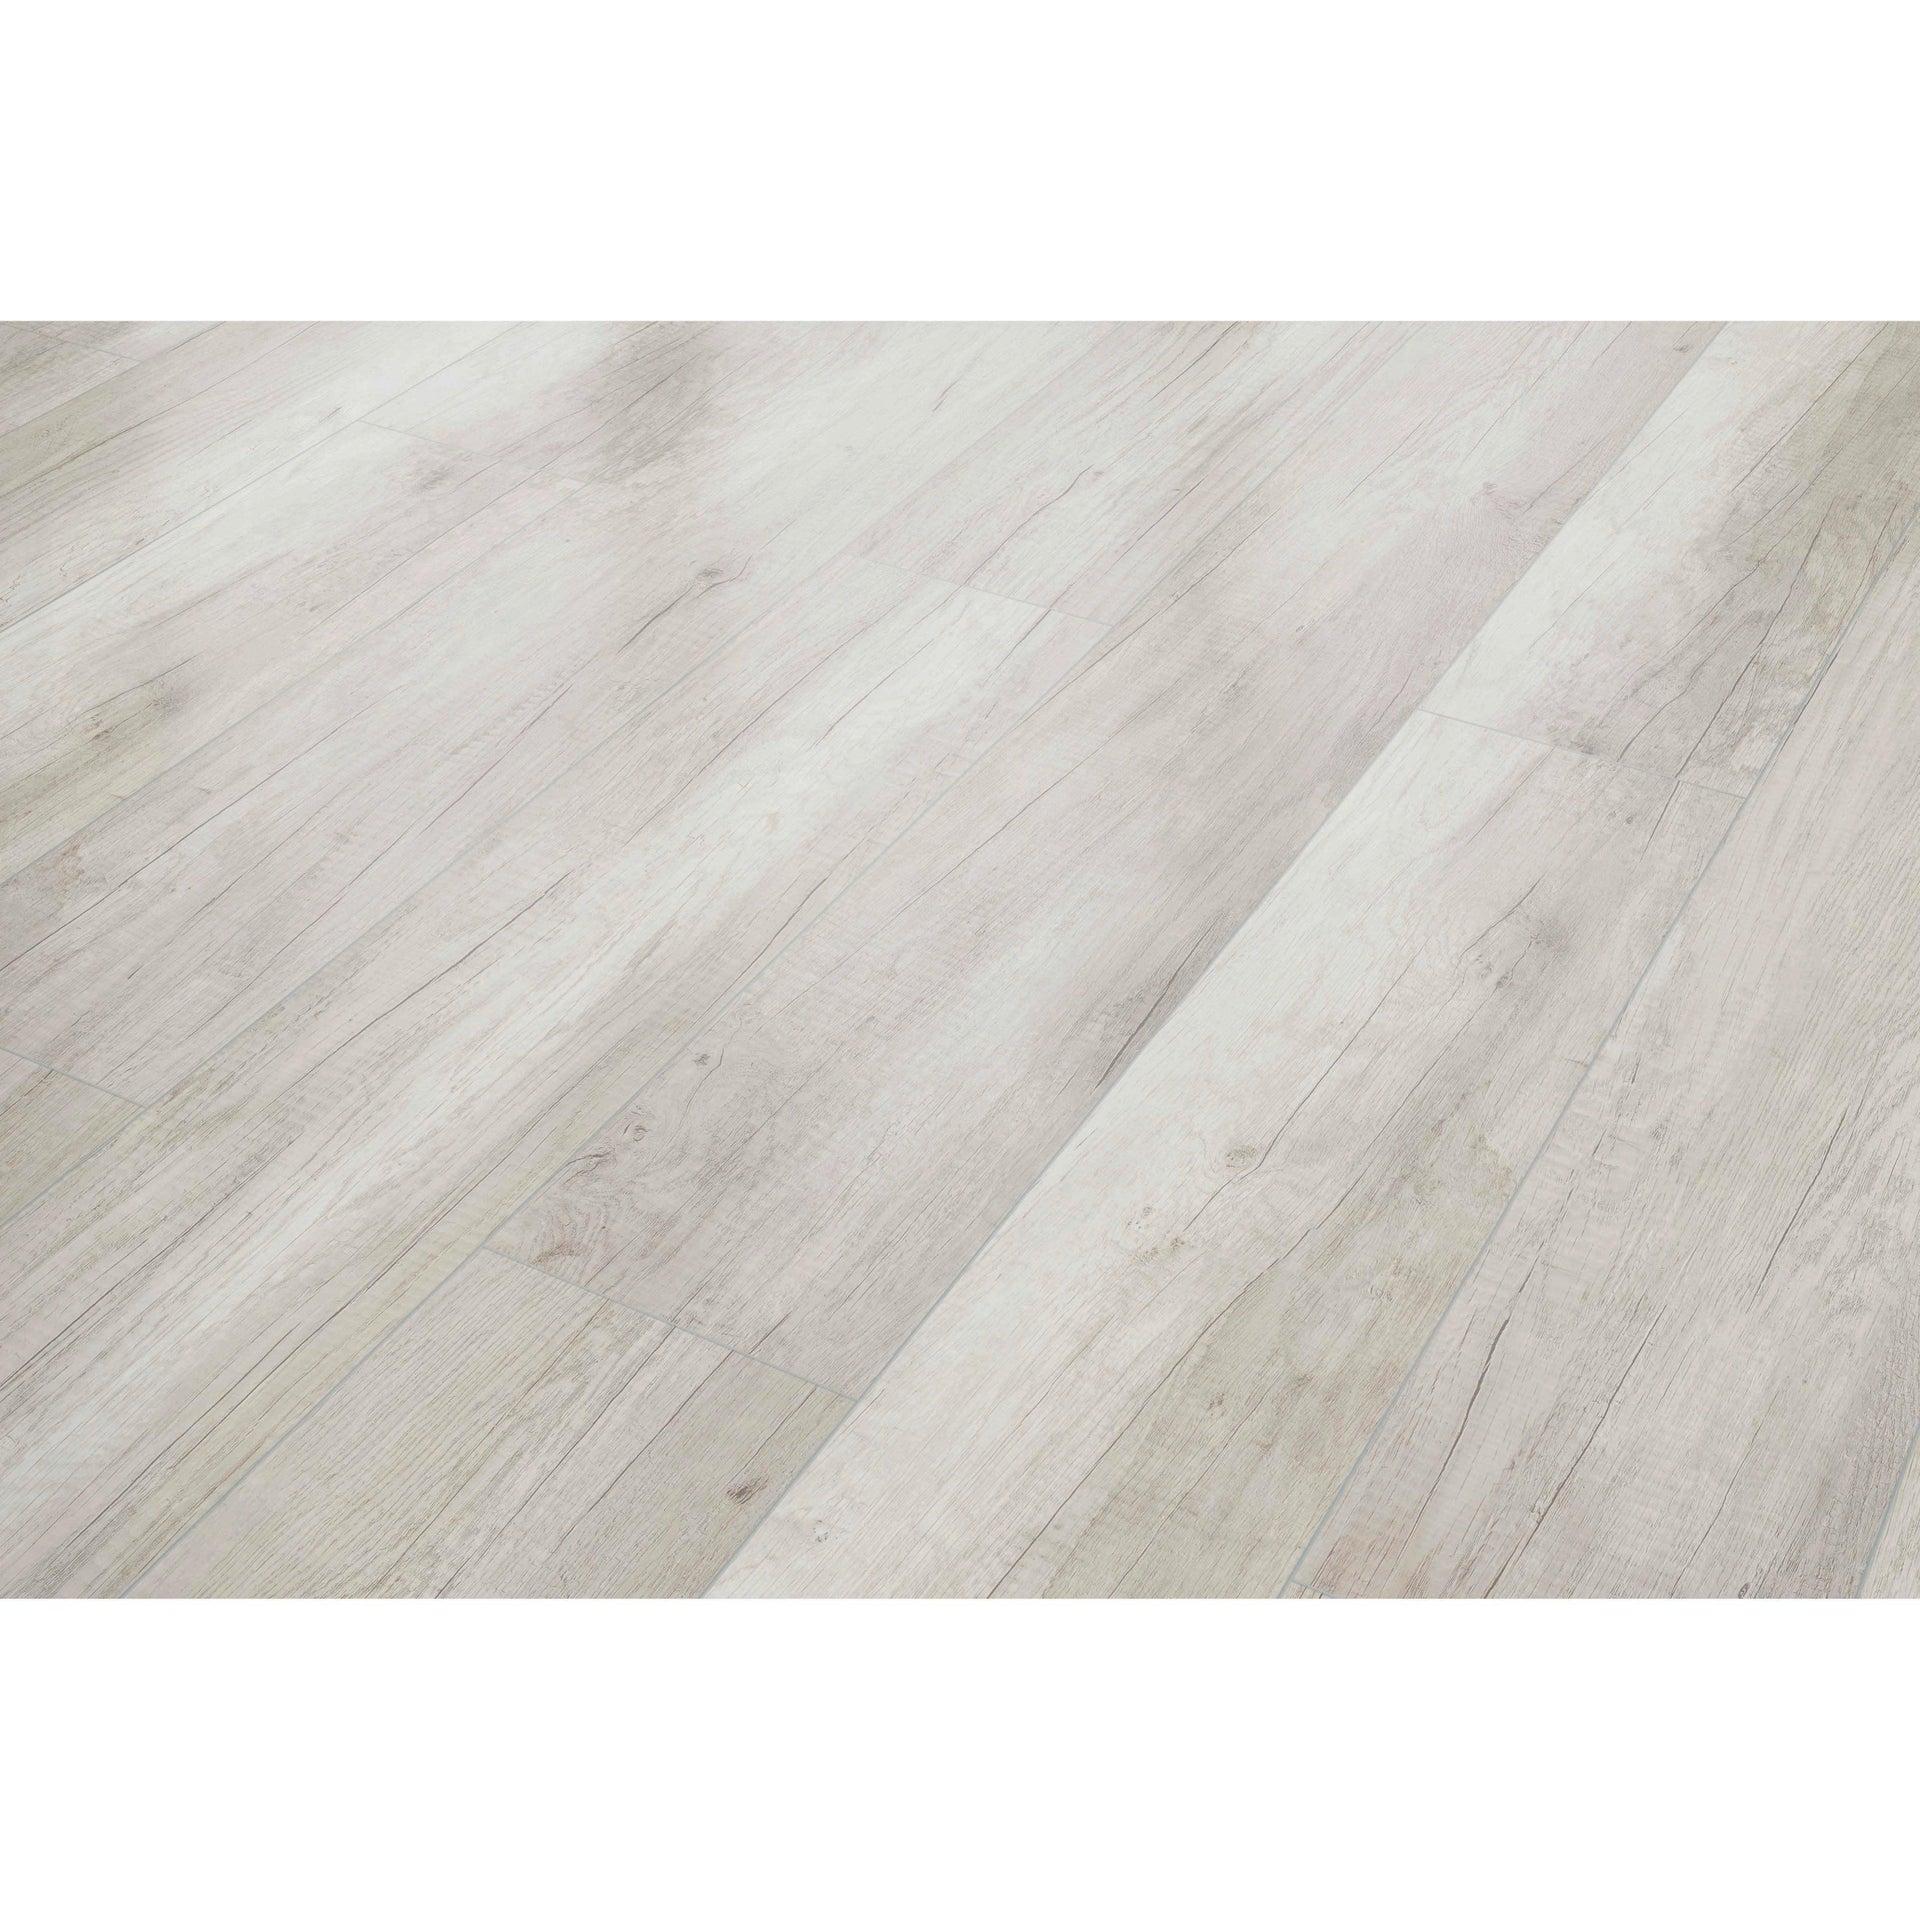 Pavimento laminato H2O Oak Sp 8 mm grigio / argento - 7